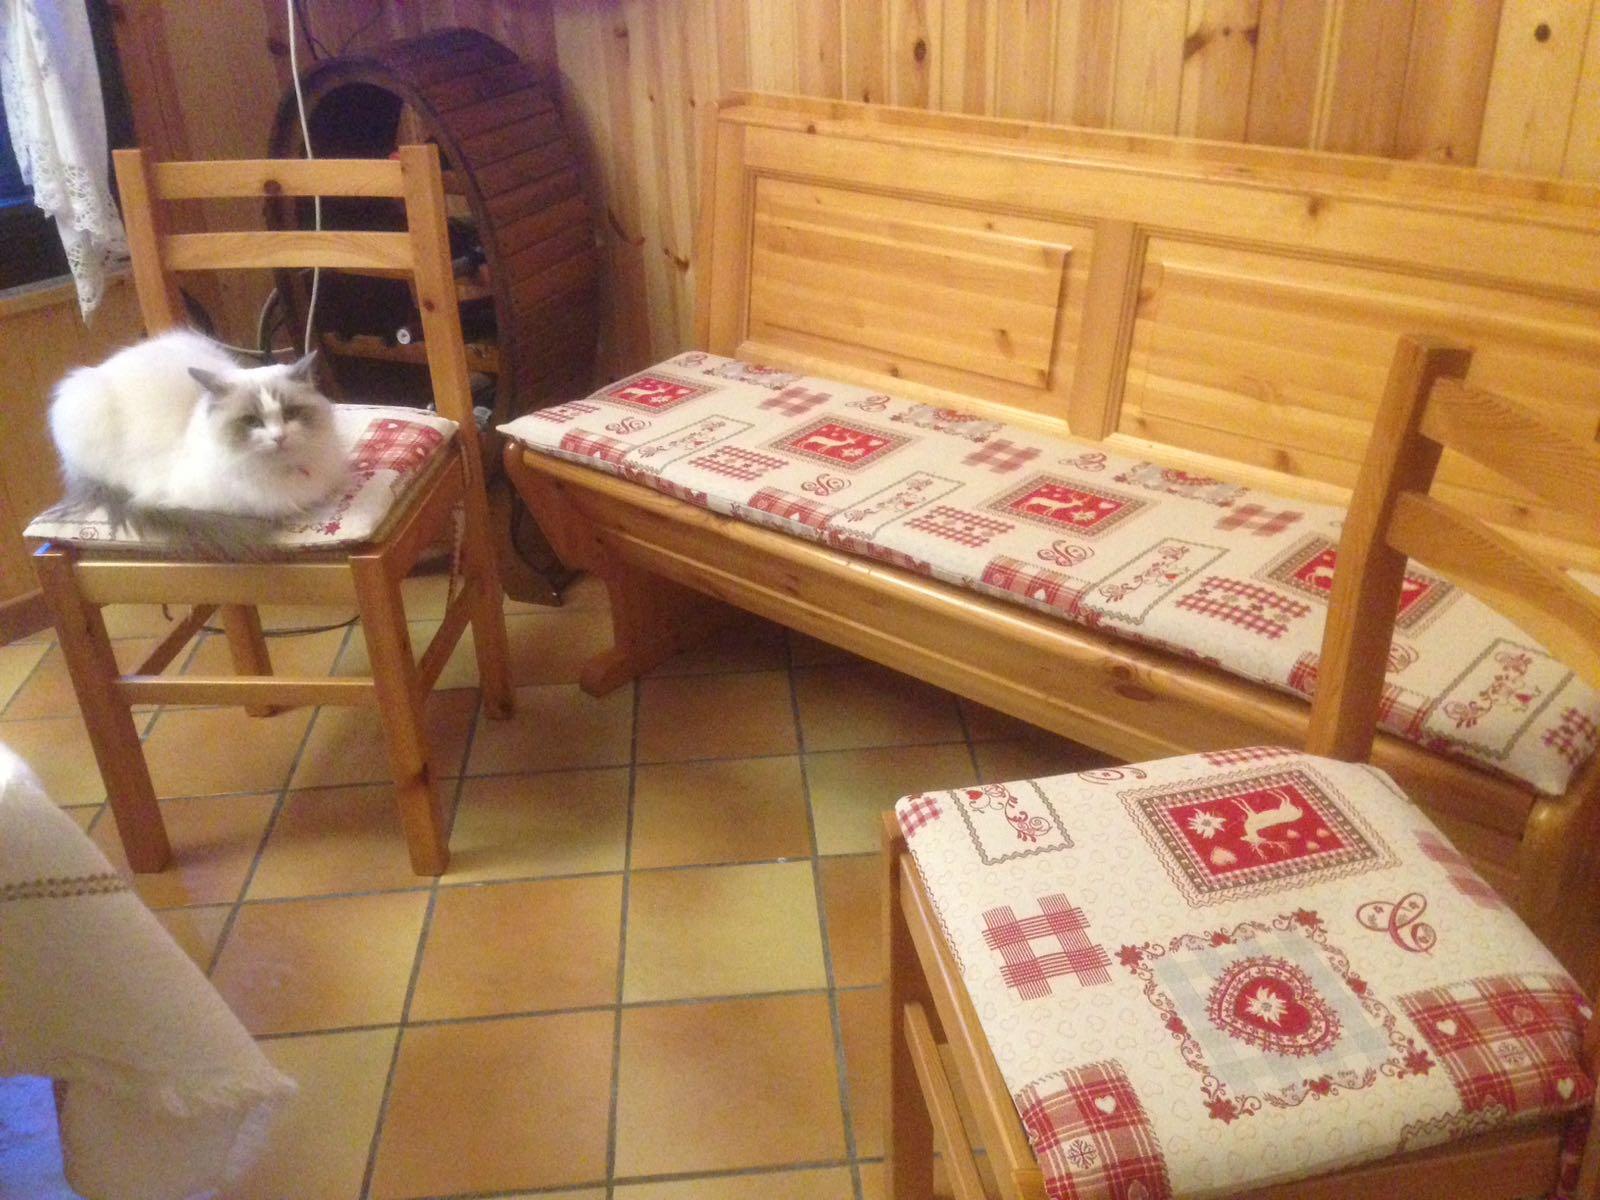 Magie creative di elena cuscino per sedia livy